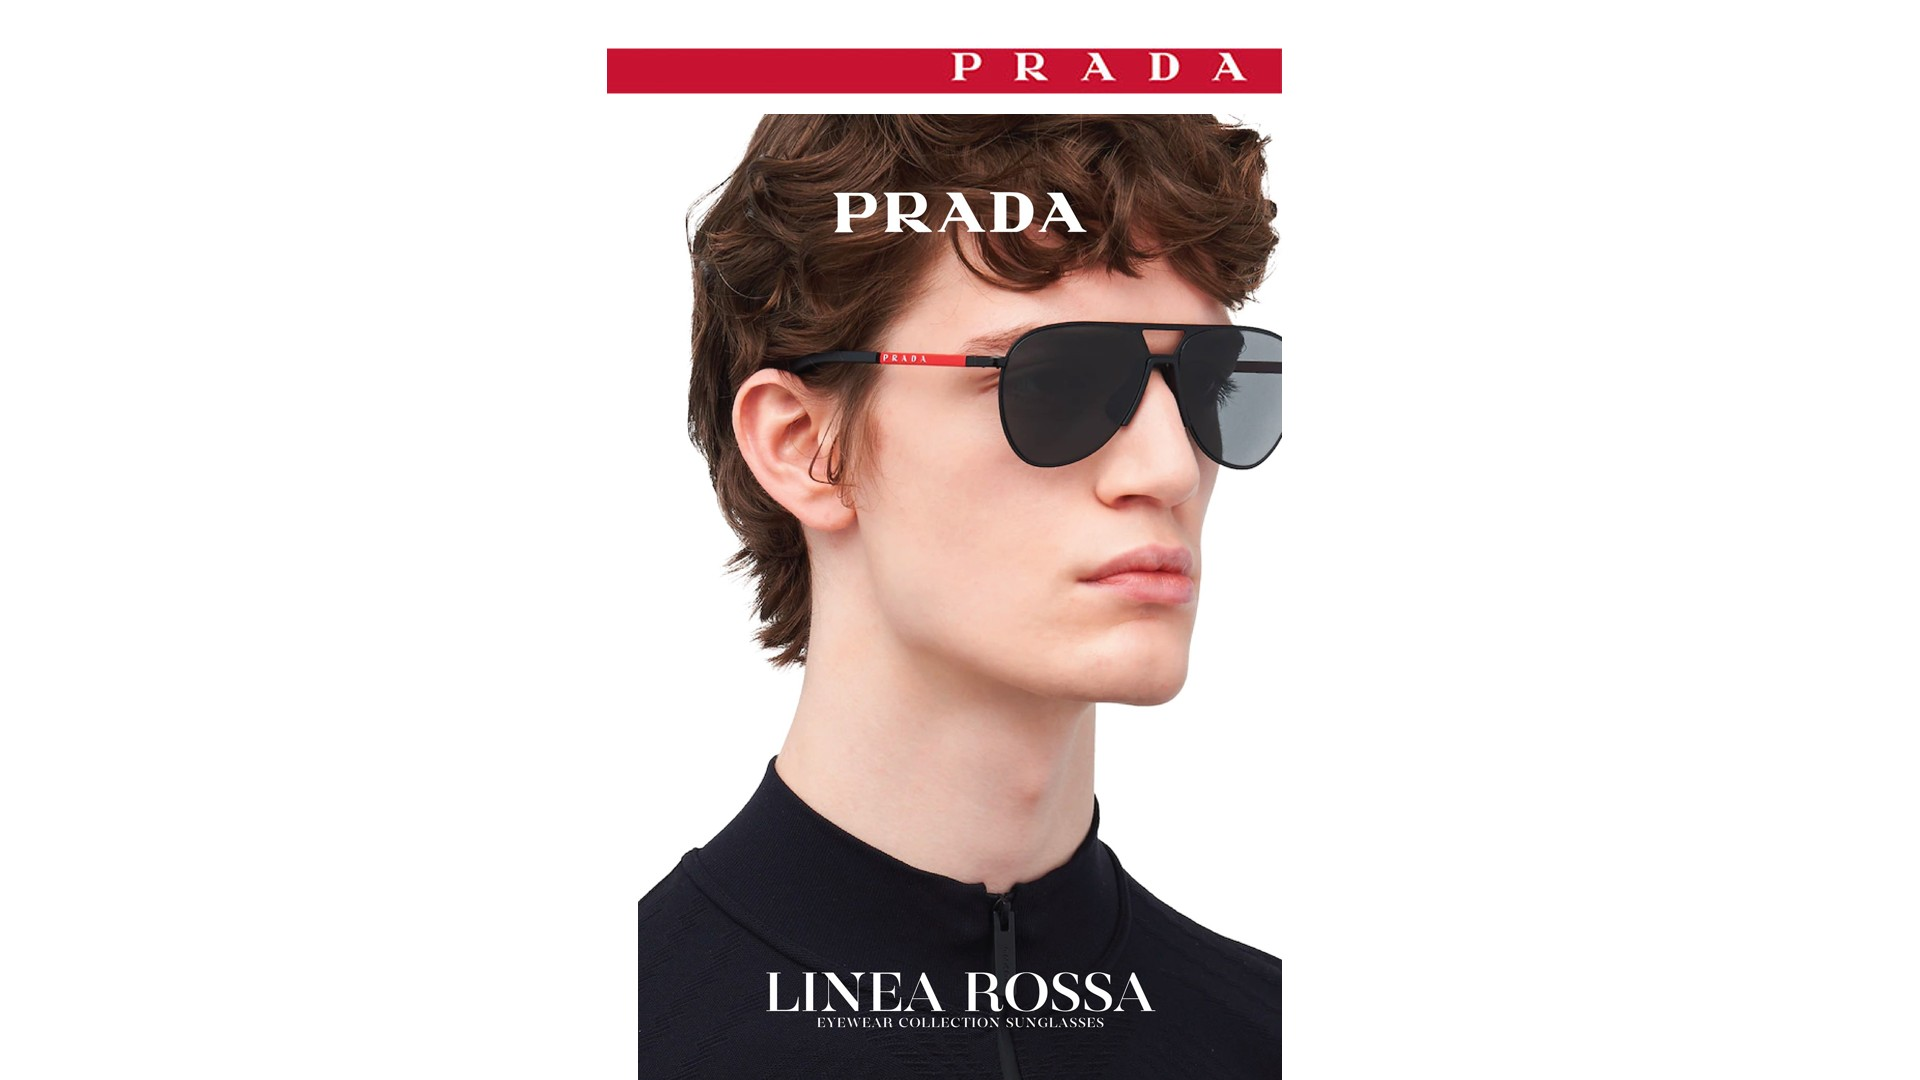 glasses PRADA PRADA LINEA ROSSA Sunglasses แว่นตา แว่นตากันแดด